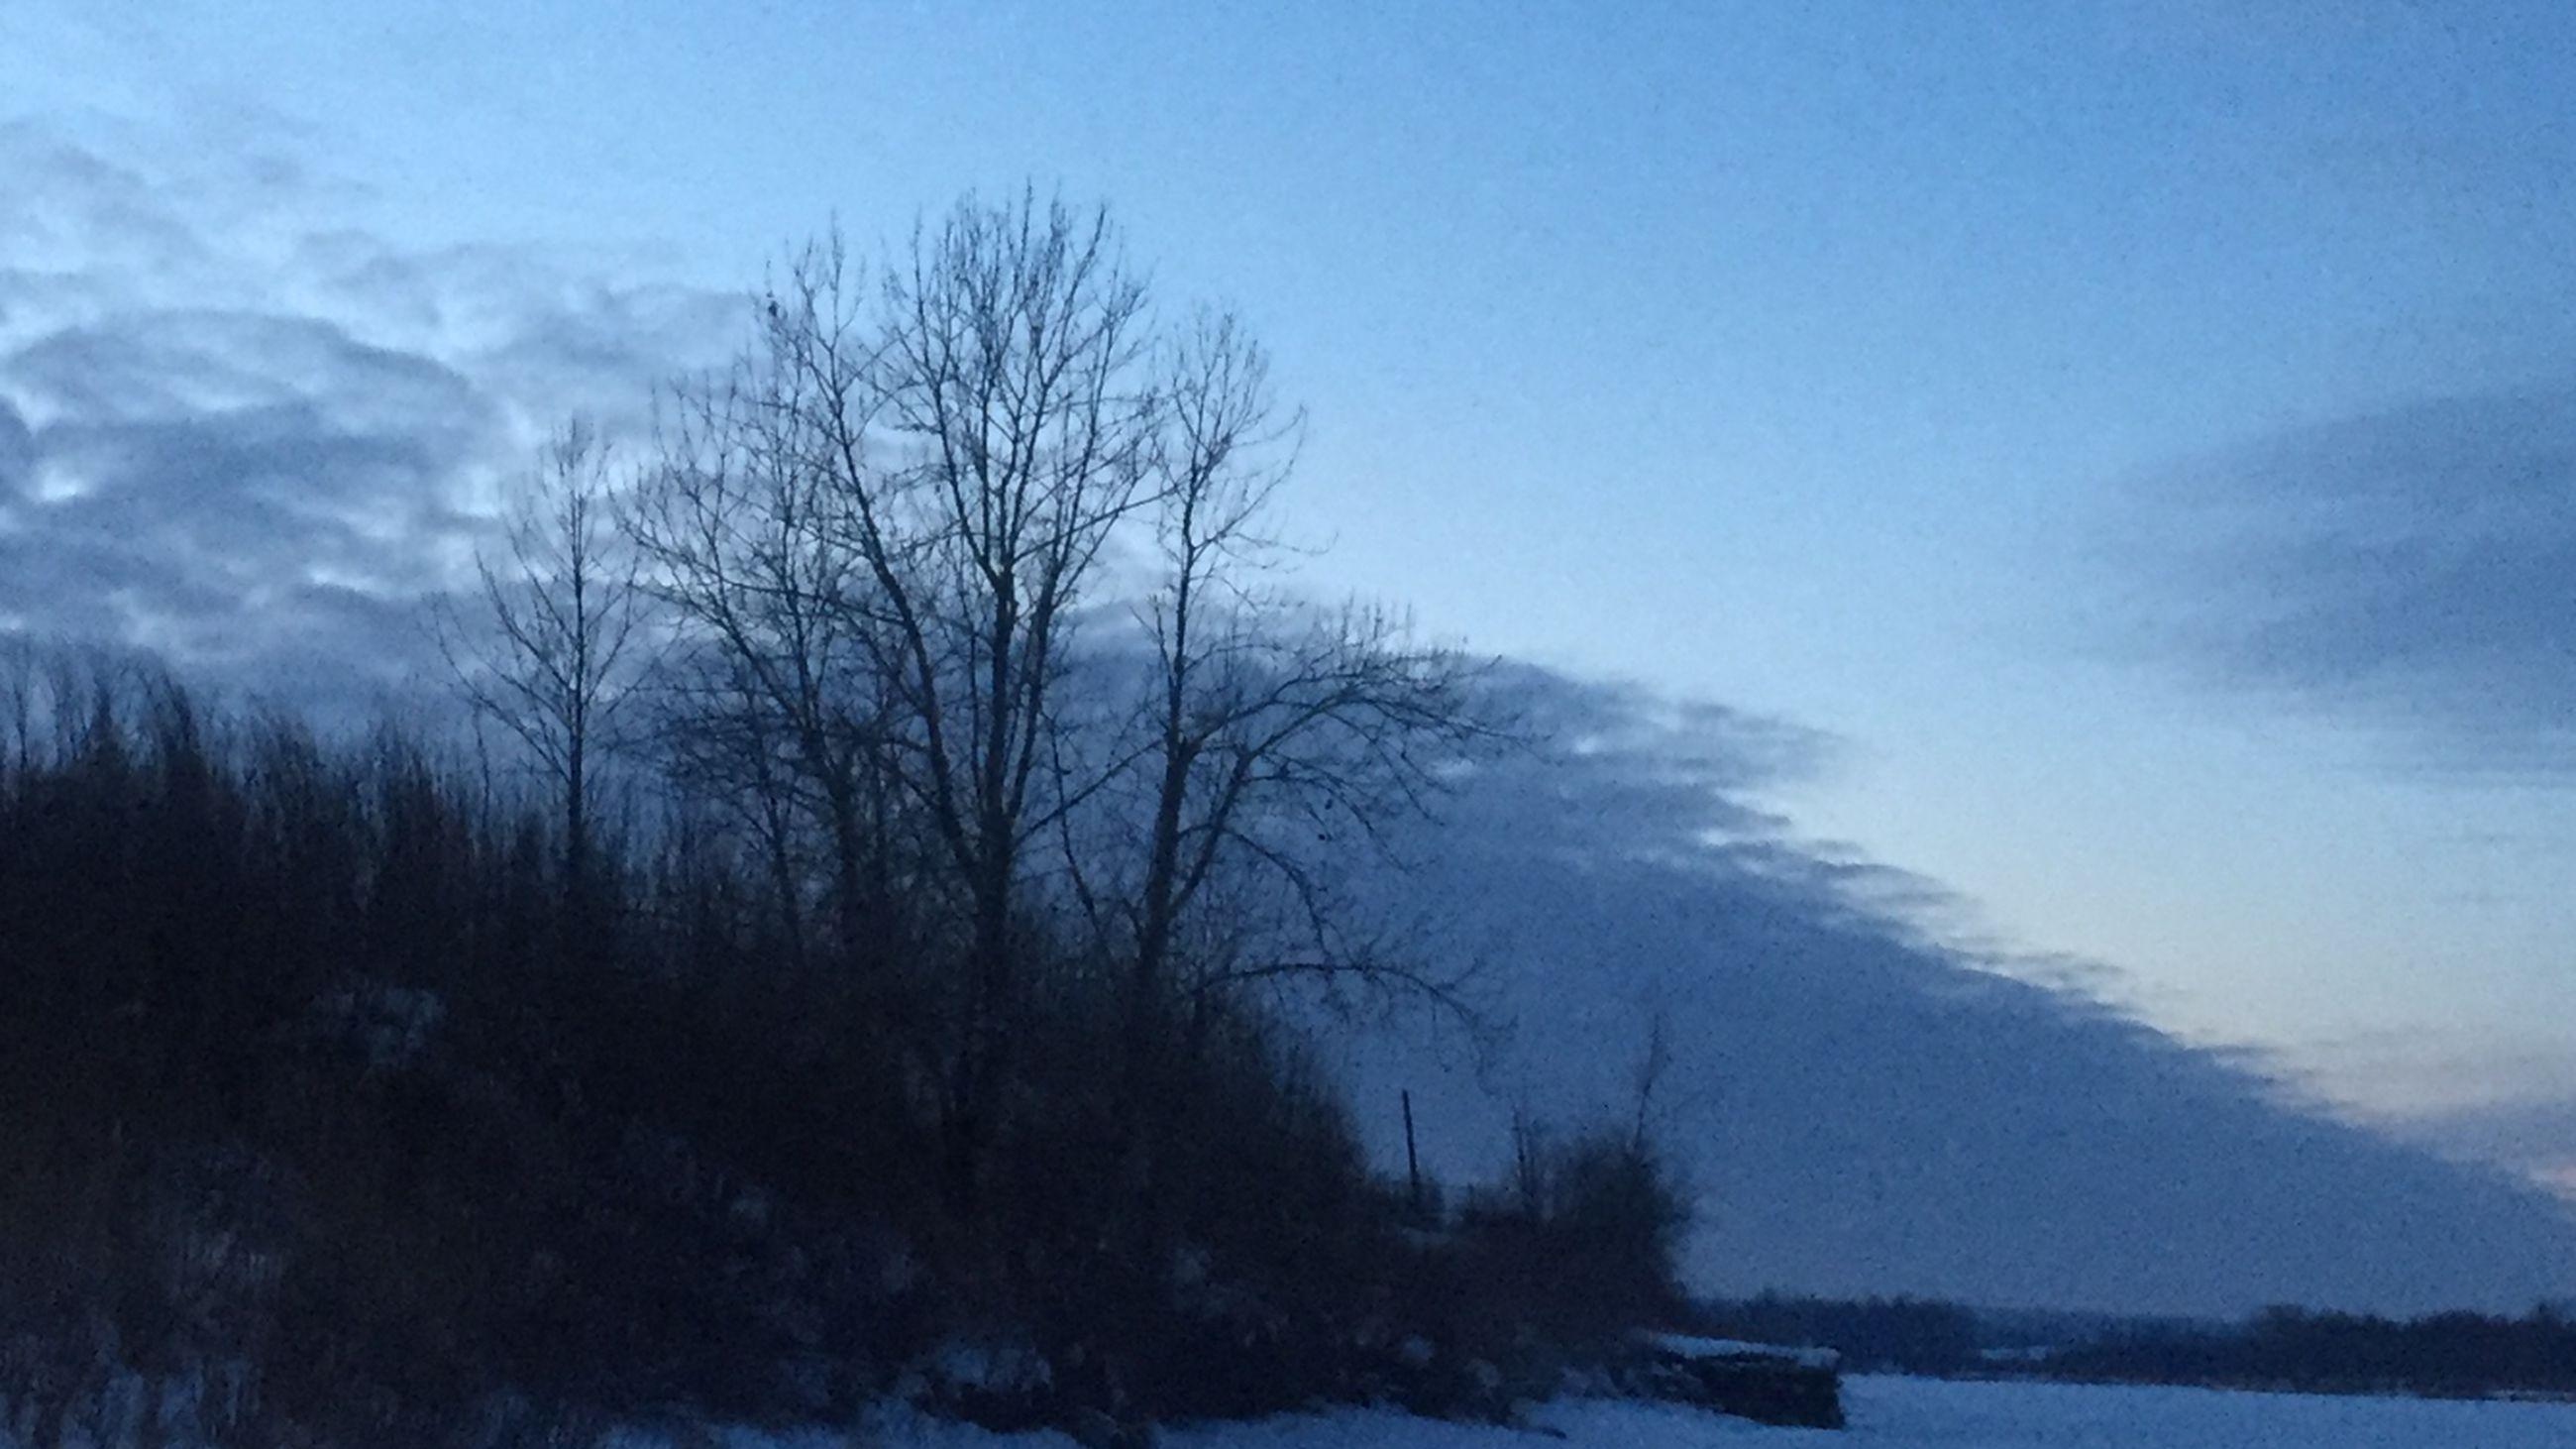 bare tree, winter, snow, cold temperature, tranquility, tranquil scene, tree, scenics, beauty in nature, sky, nature, weather, landscape, season, branch, non-urban scene, covering, frozen, cloud - sky, field